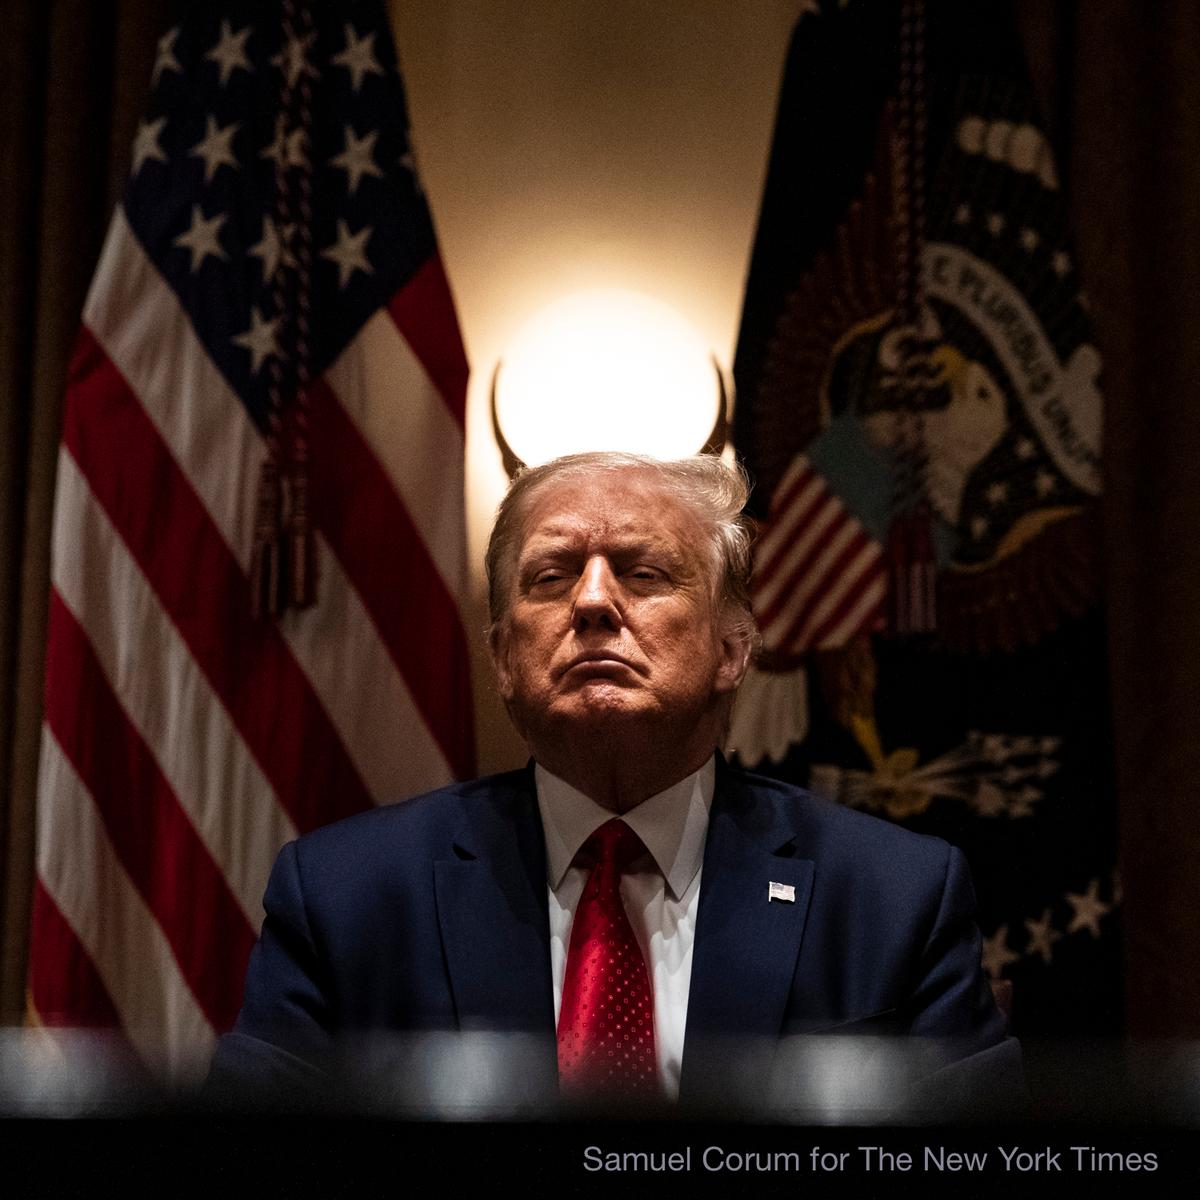 President Donald Trump, #WhiteHouse in Washington, DC on July 9, 2020. (📹@corumphoto)